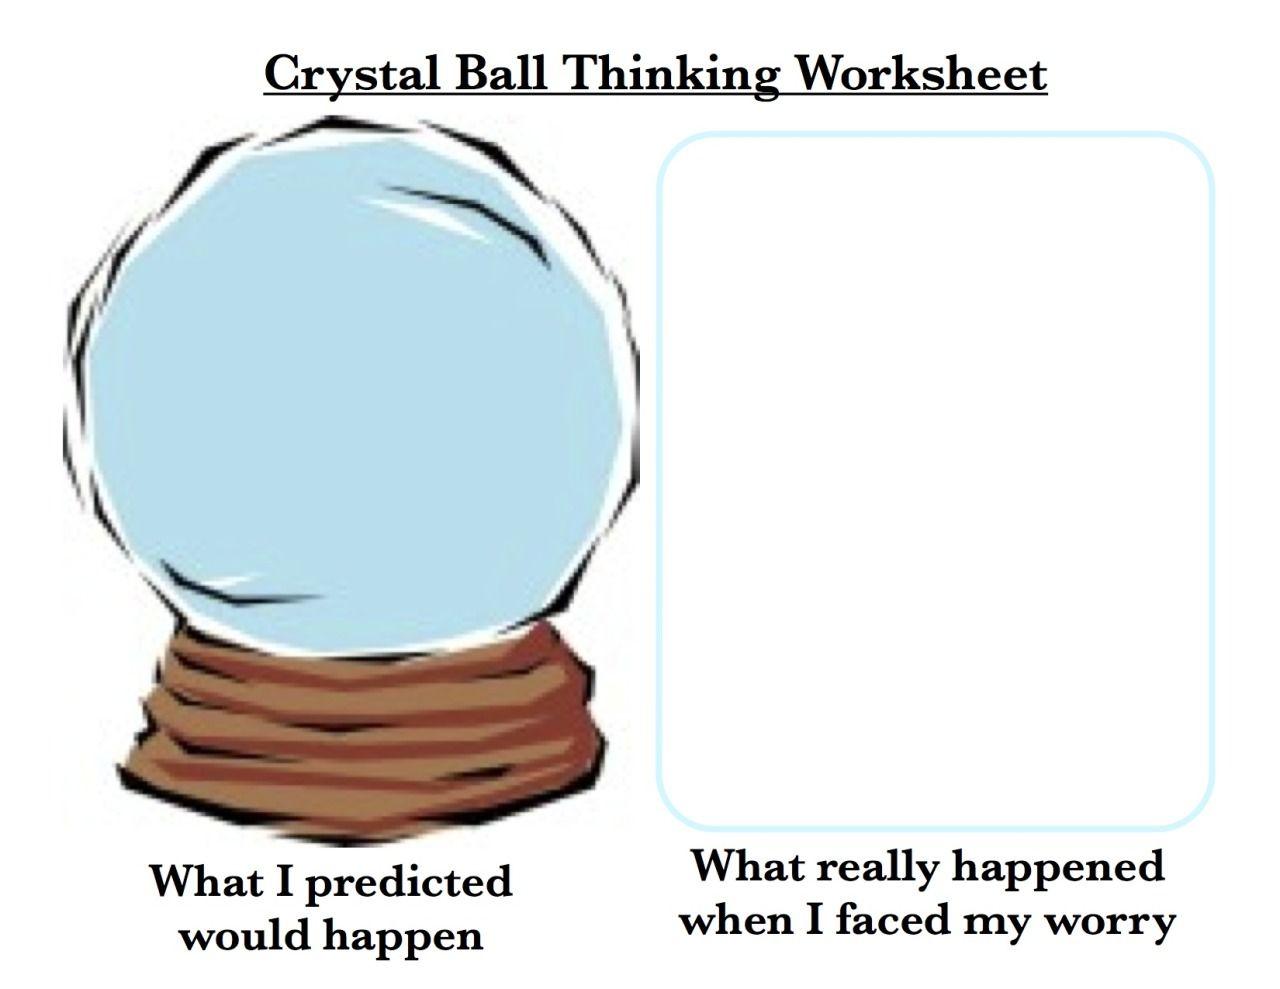 Workbooks tf cbt workbook for children : Crystal Ball Thinking Worksheet | Psychology | Pinterest | Crystal ...